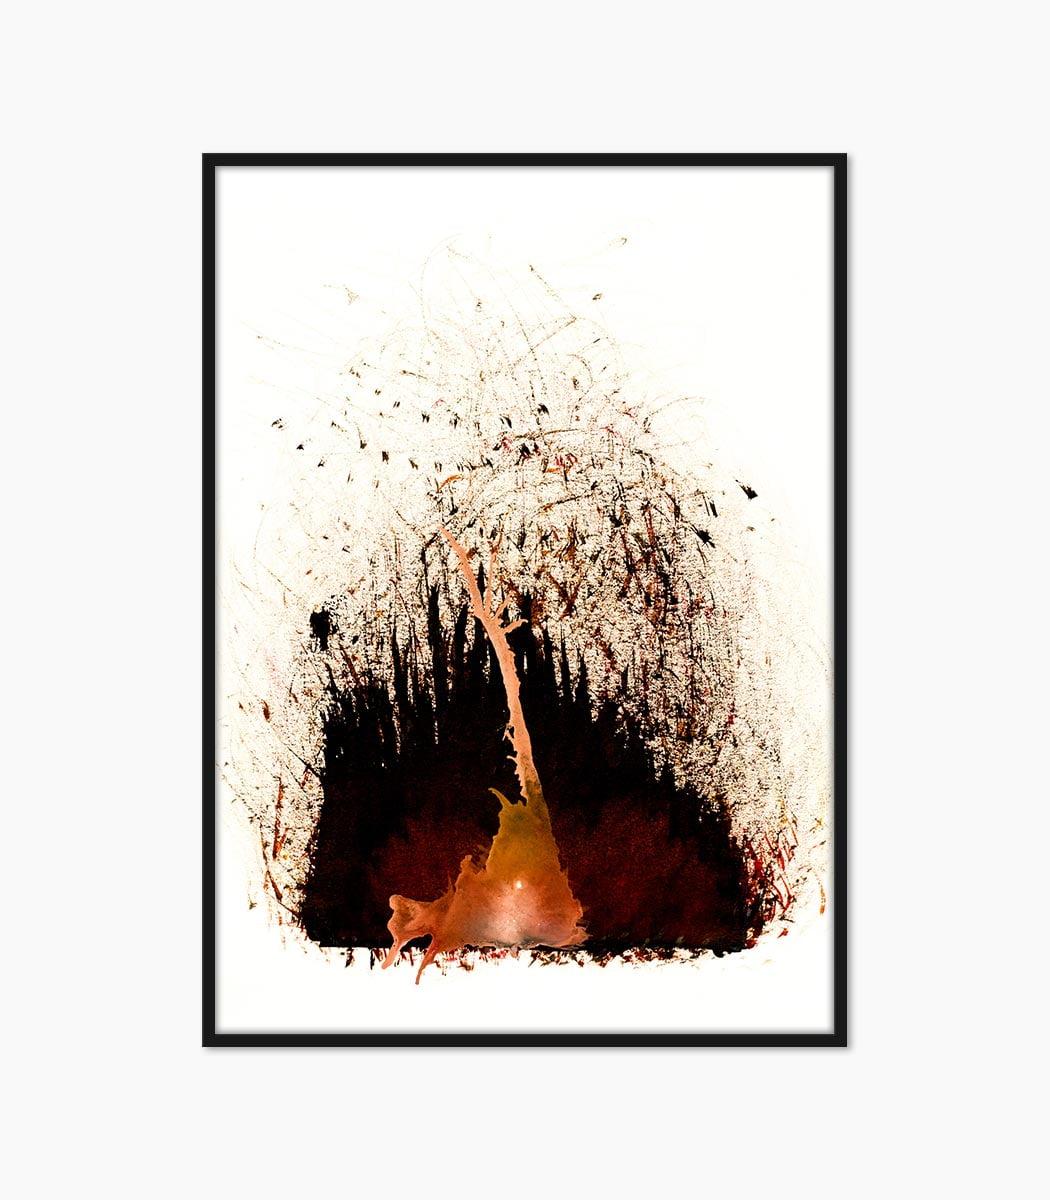 print abstract compozitie creat manual si printat la calitate superioara numai pe www.artwall.ro